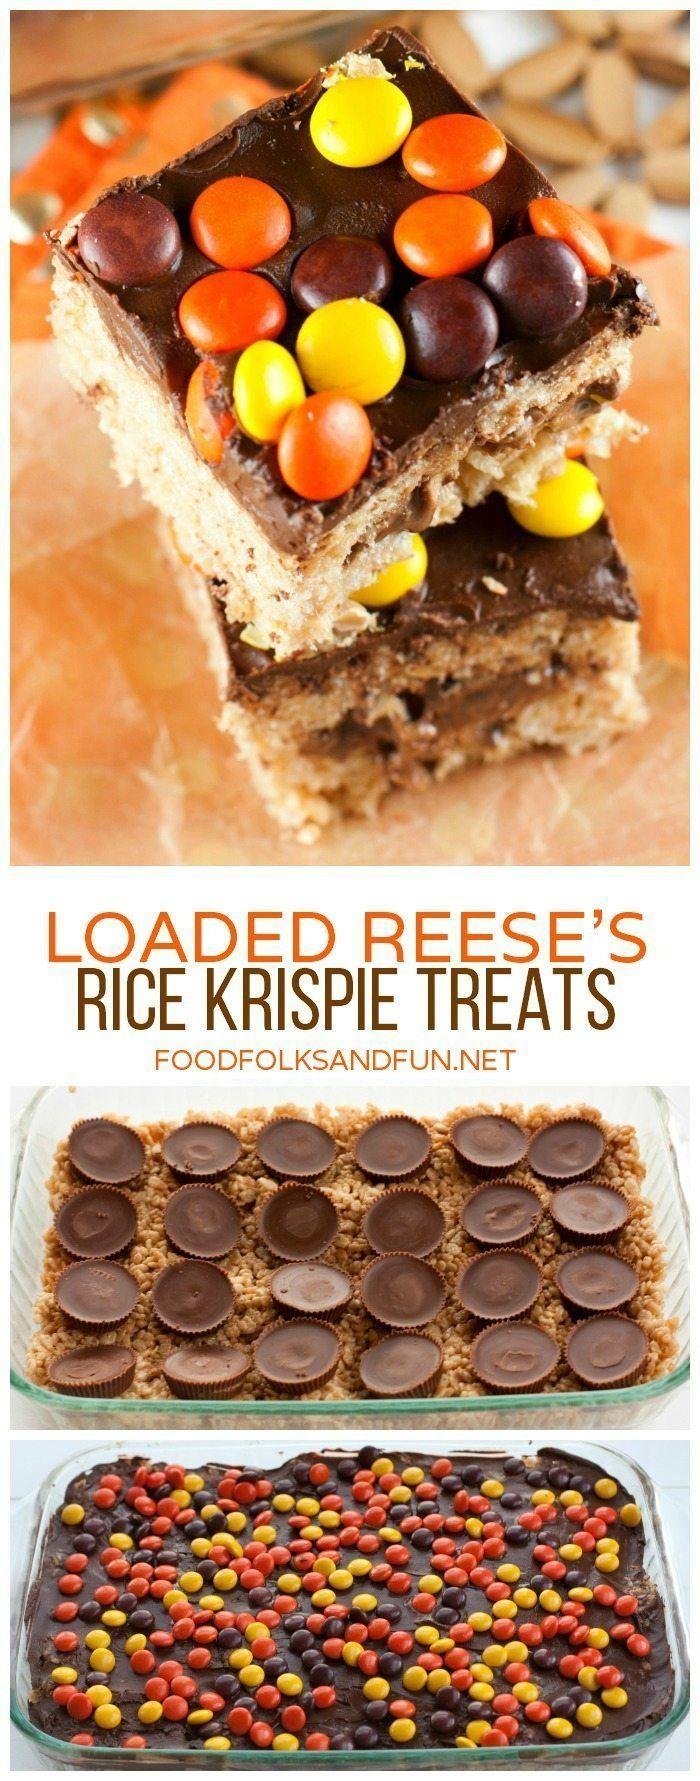 Reese's Rice Krispies Treats